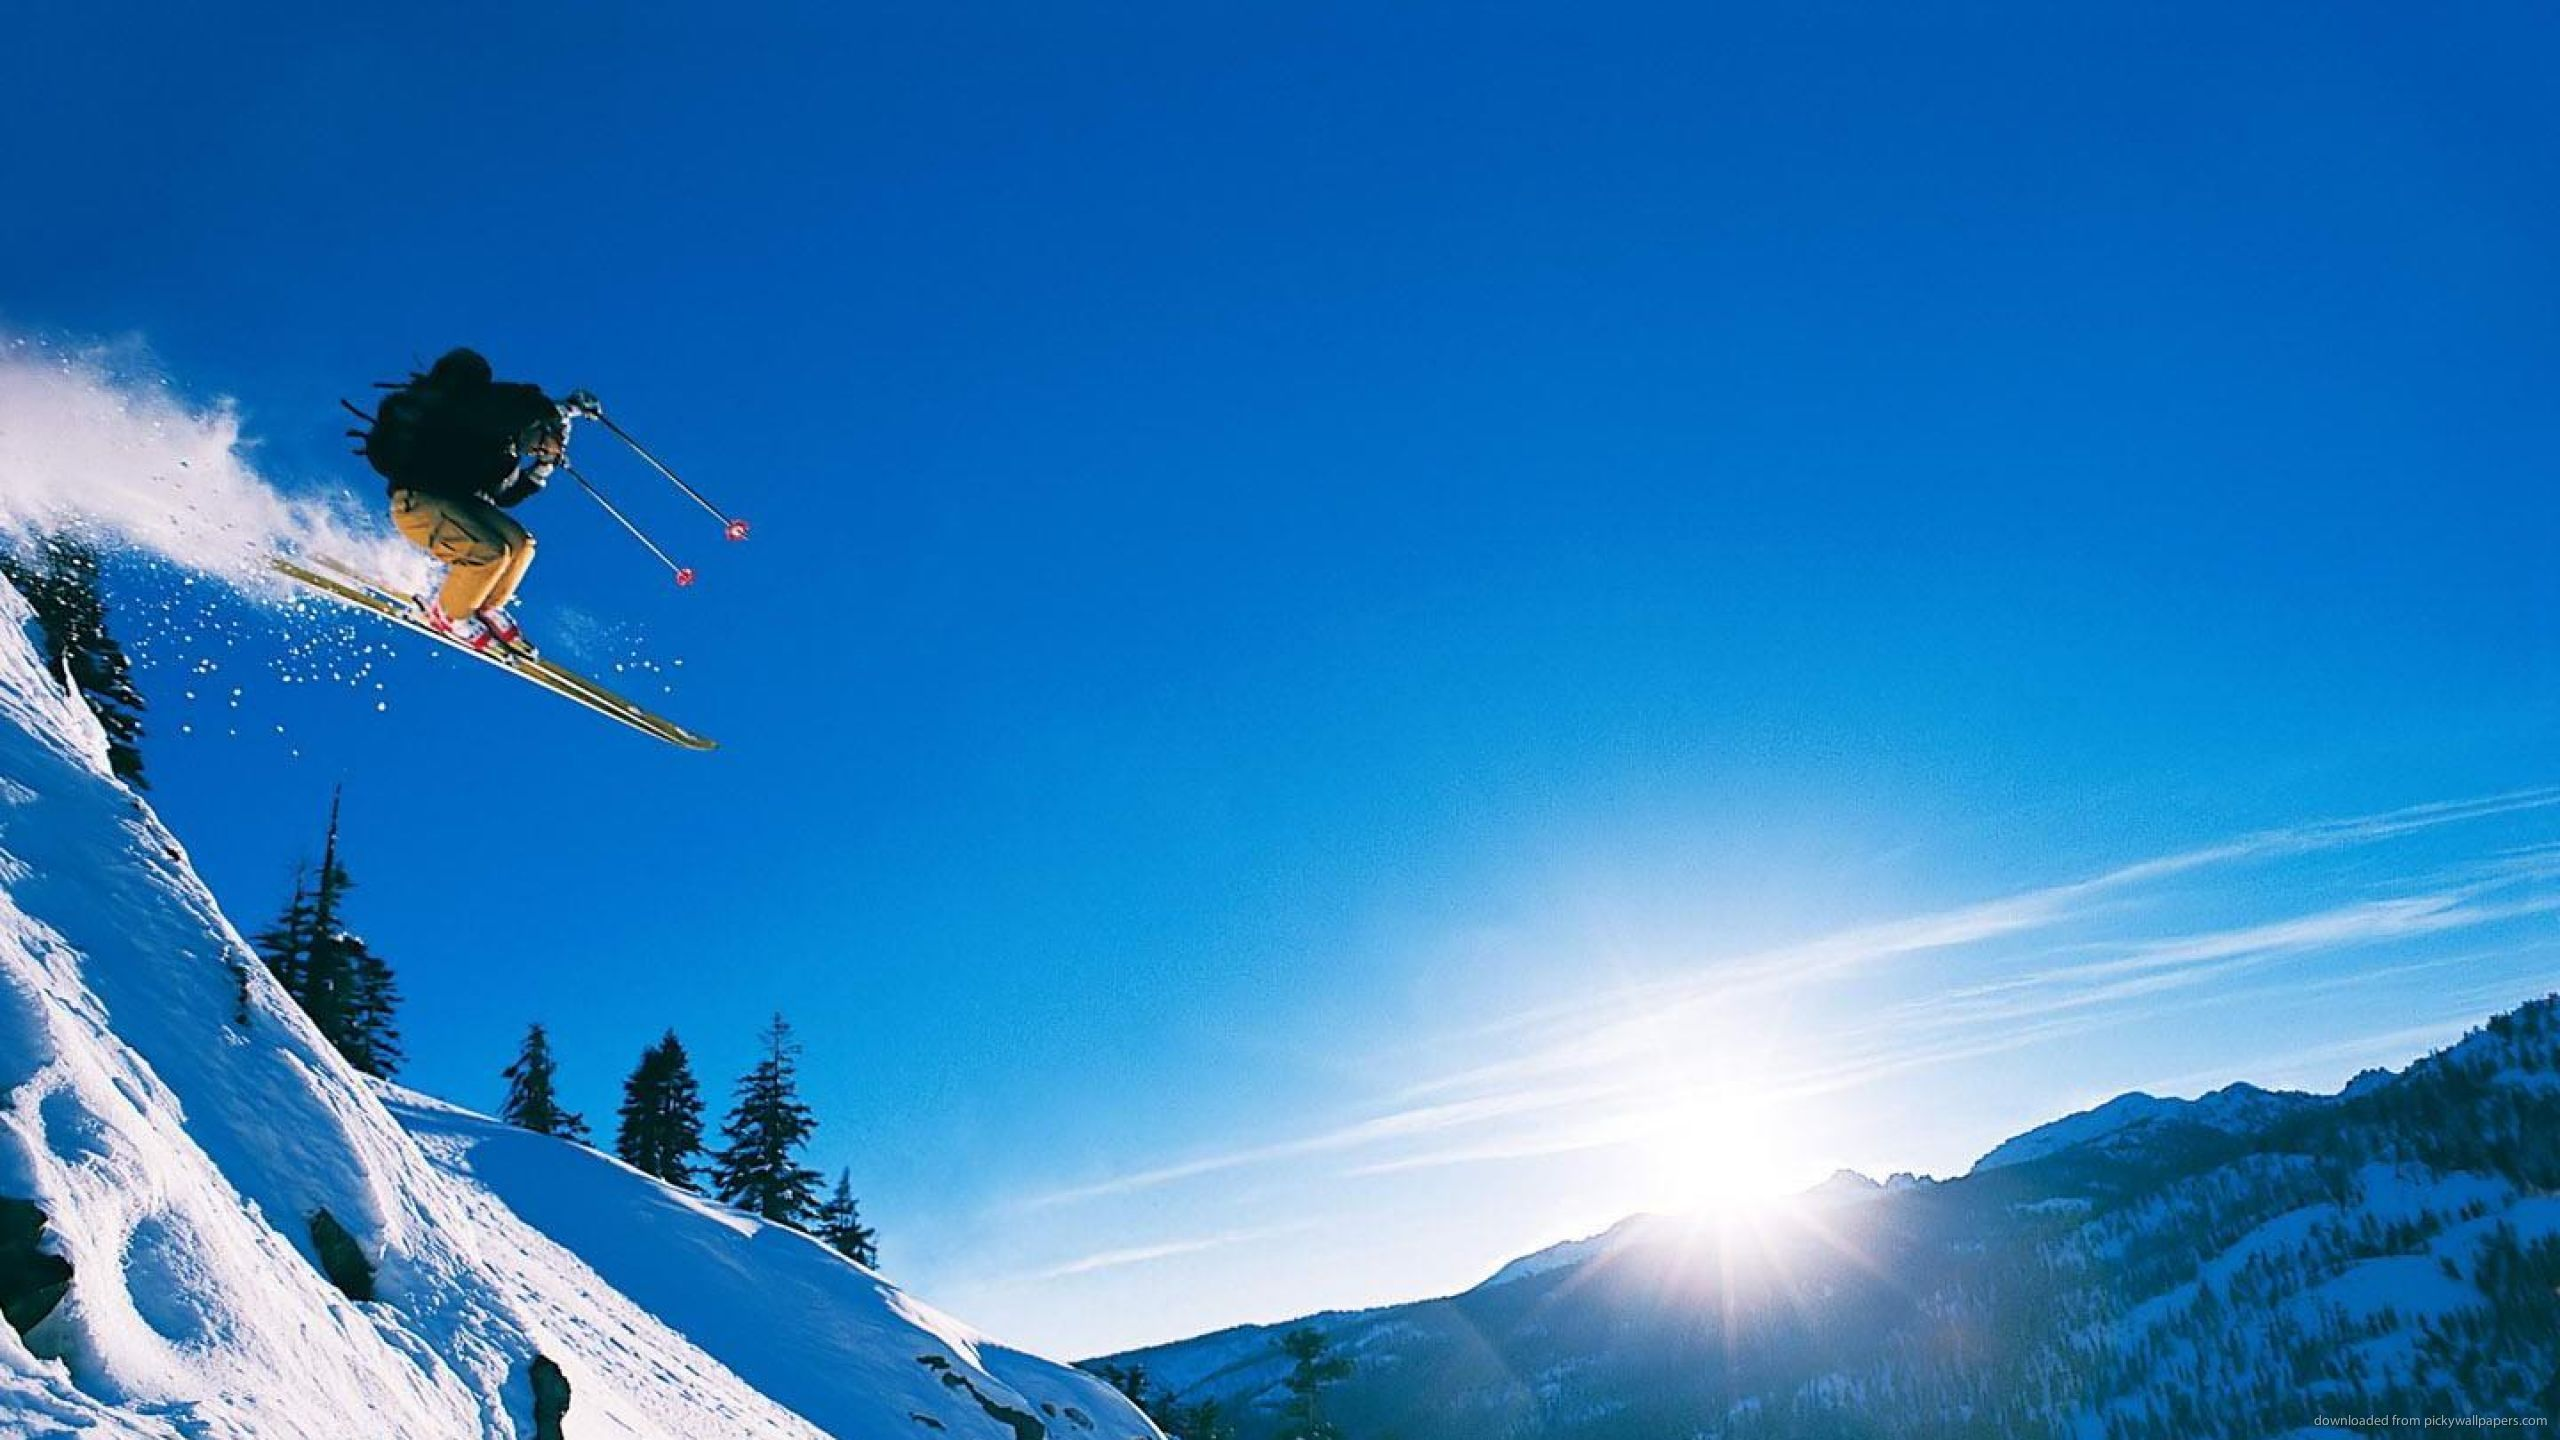 Ski Wallpapers WallpaperUP 1600x1200 Wallpaper 47